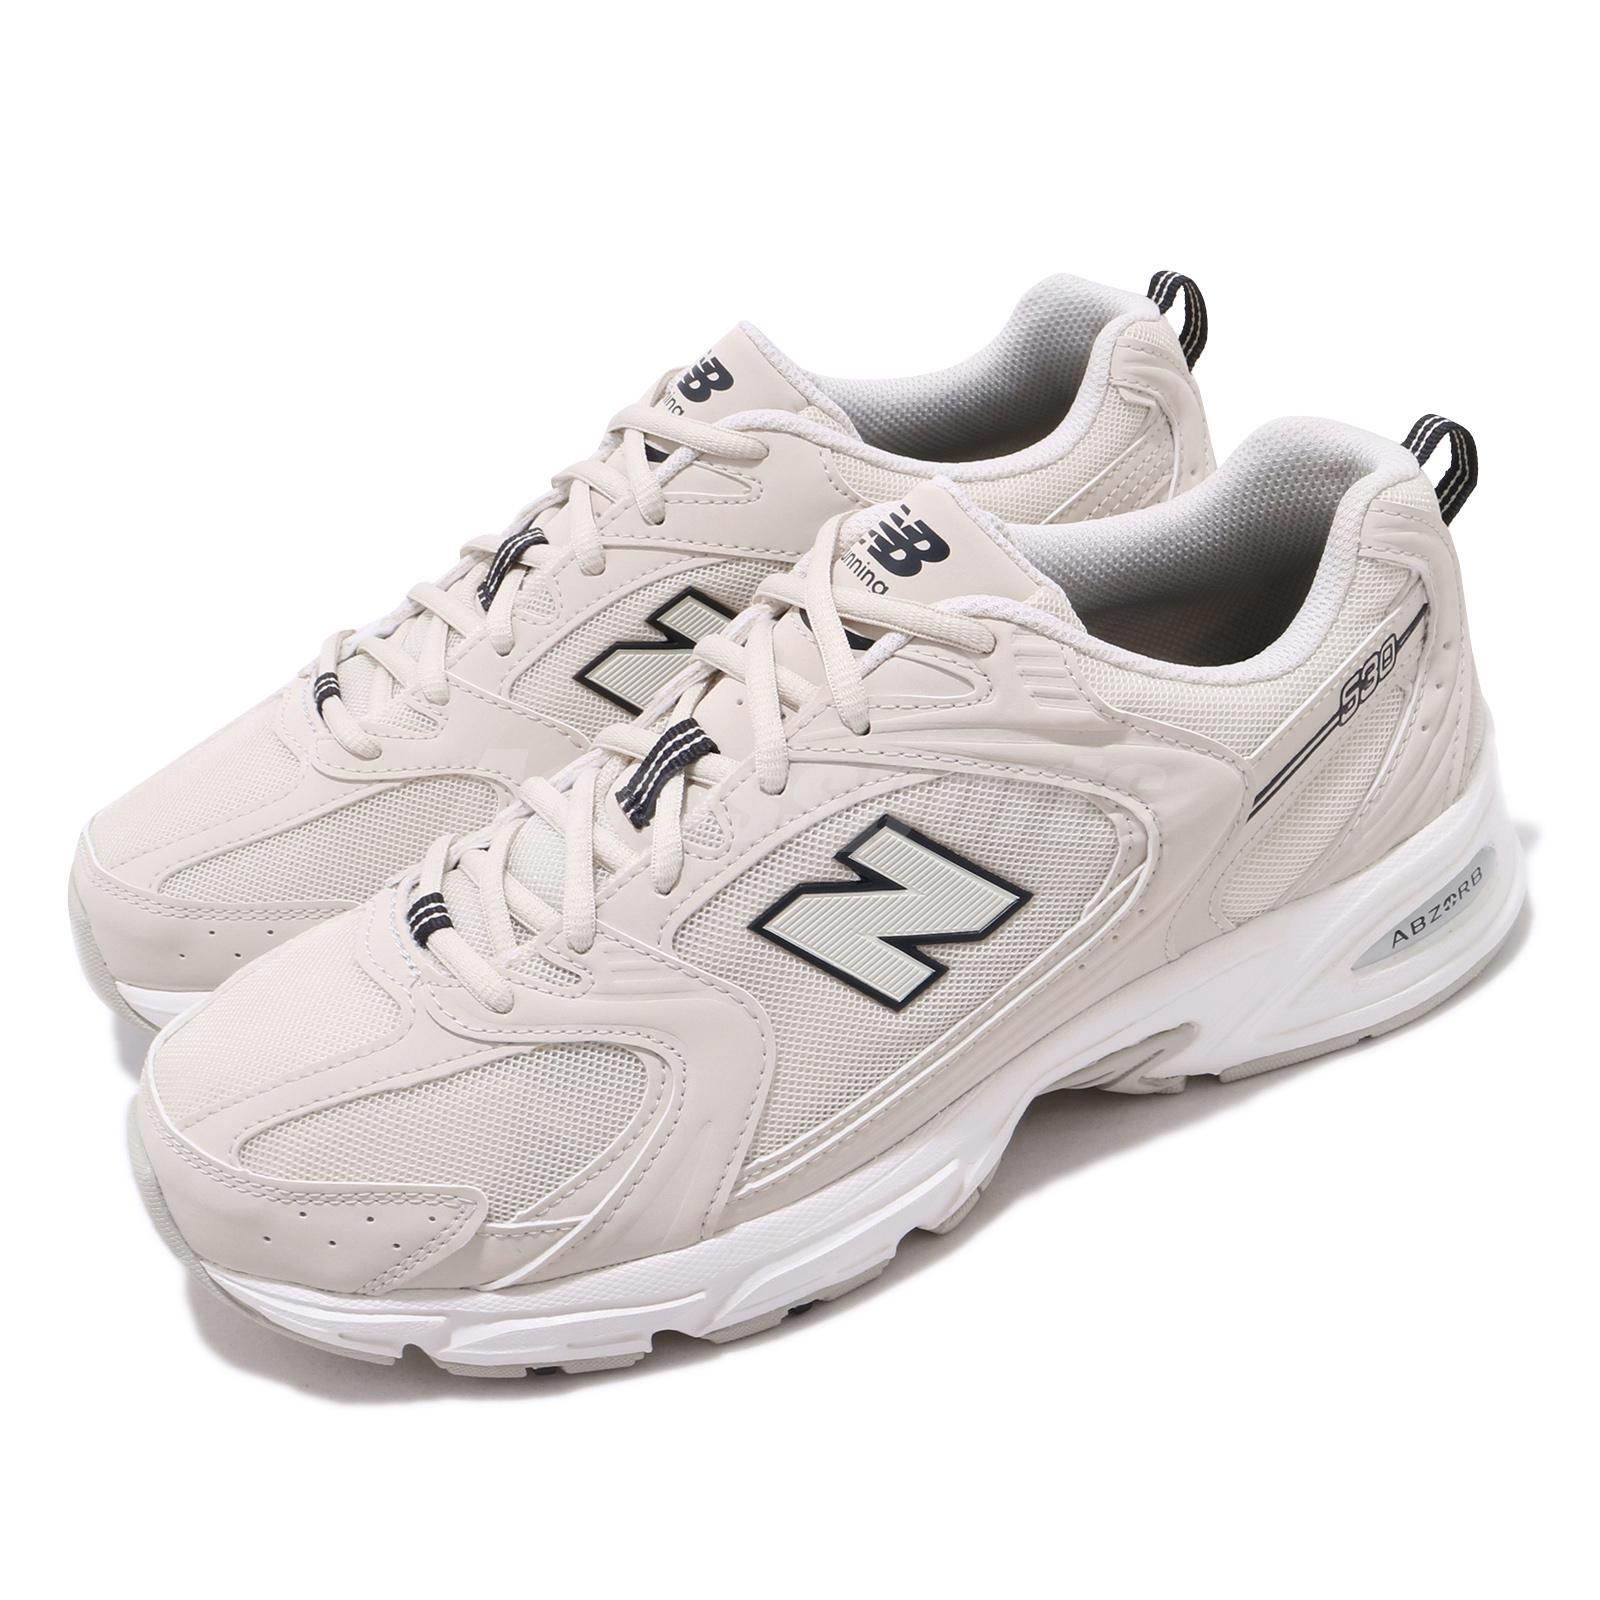 new balance running shoes 993 mens